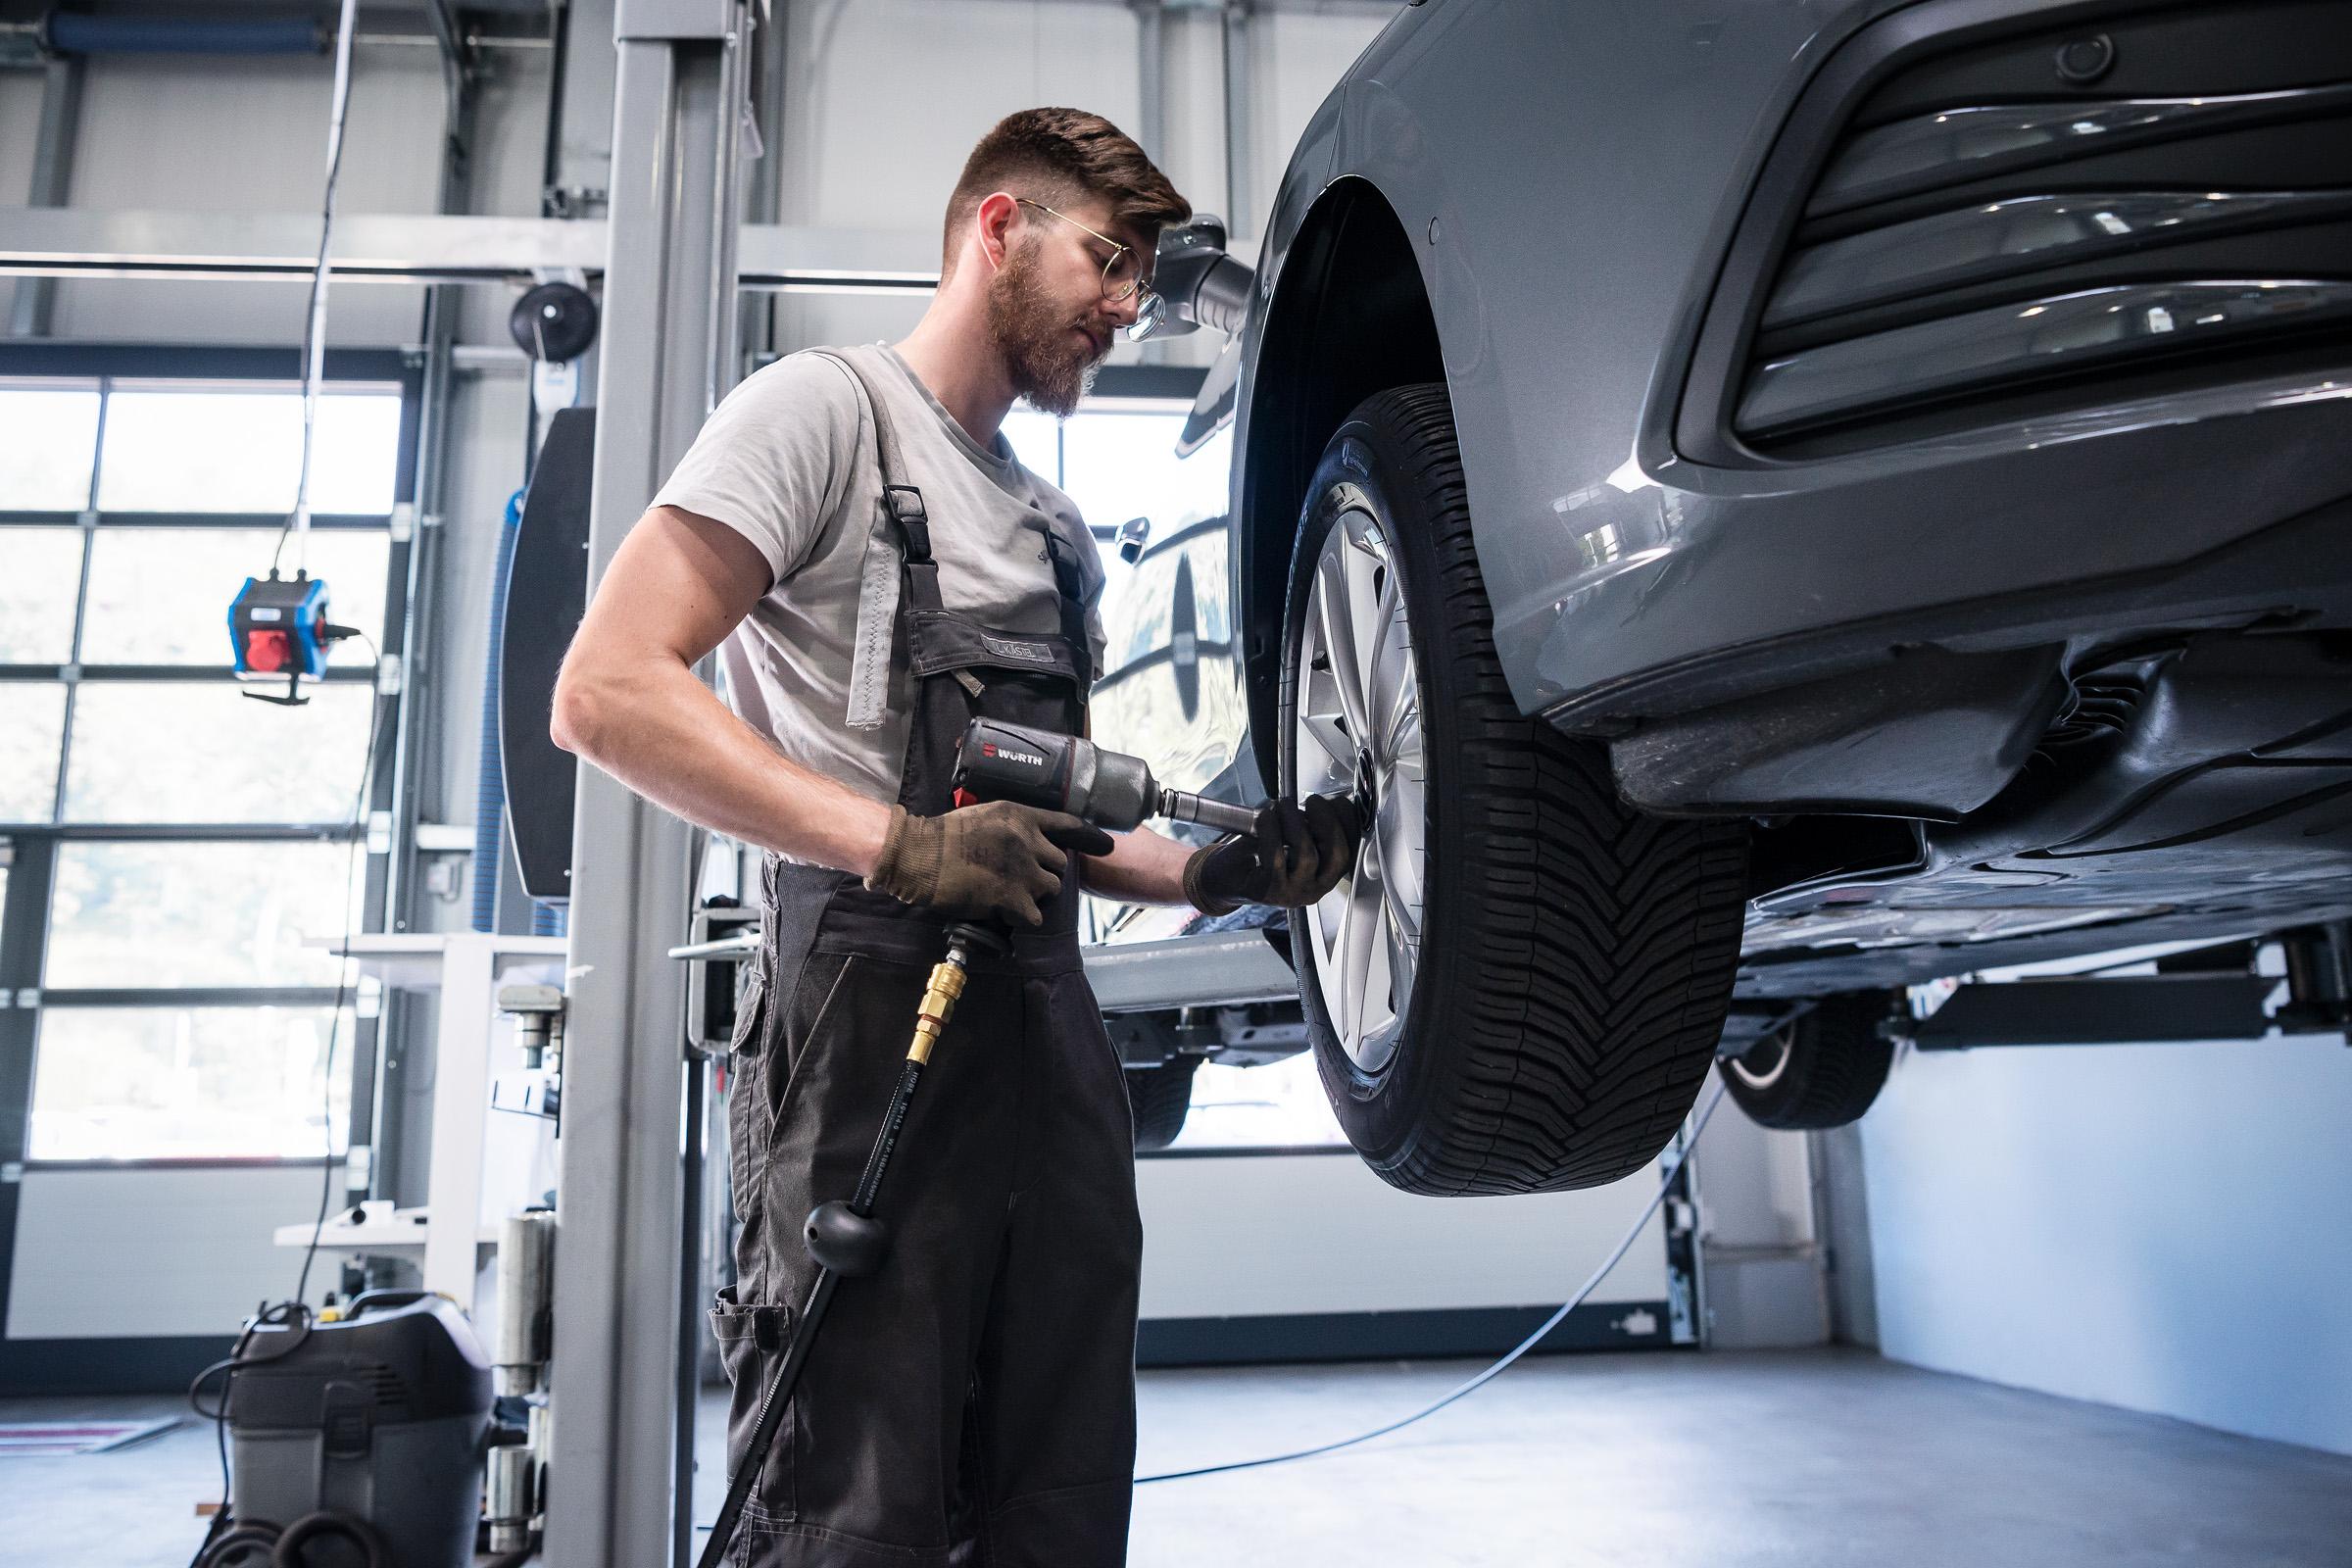 autohaus-morrkopf-weingarten-gebrauchtwagen-leasing-Reifenwechsel-2